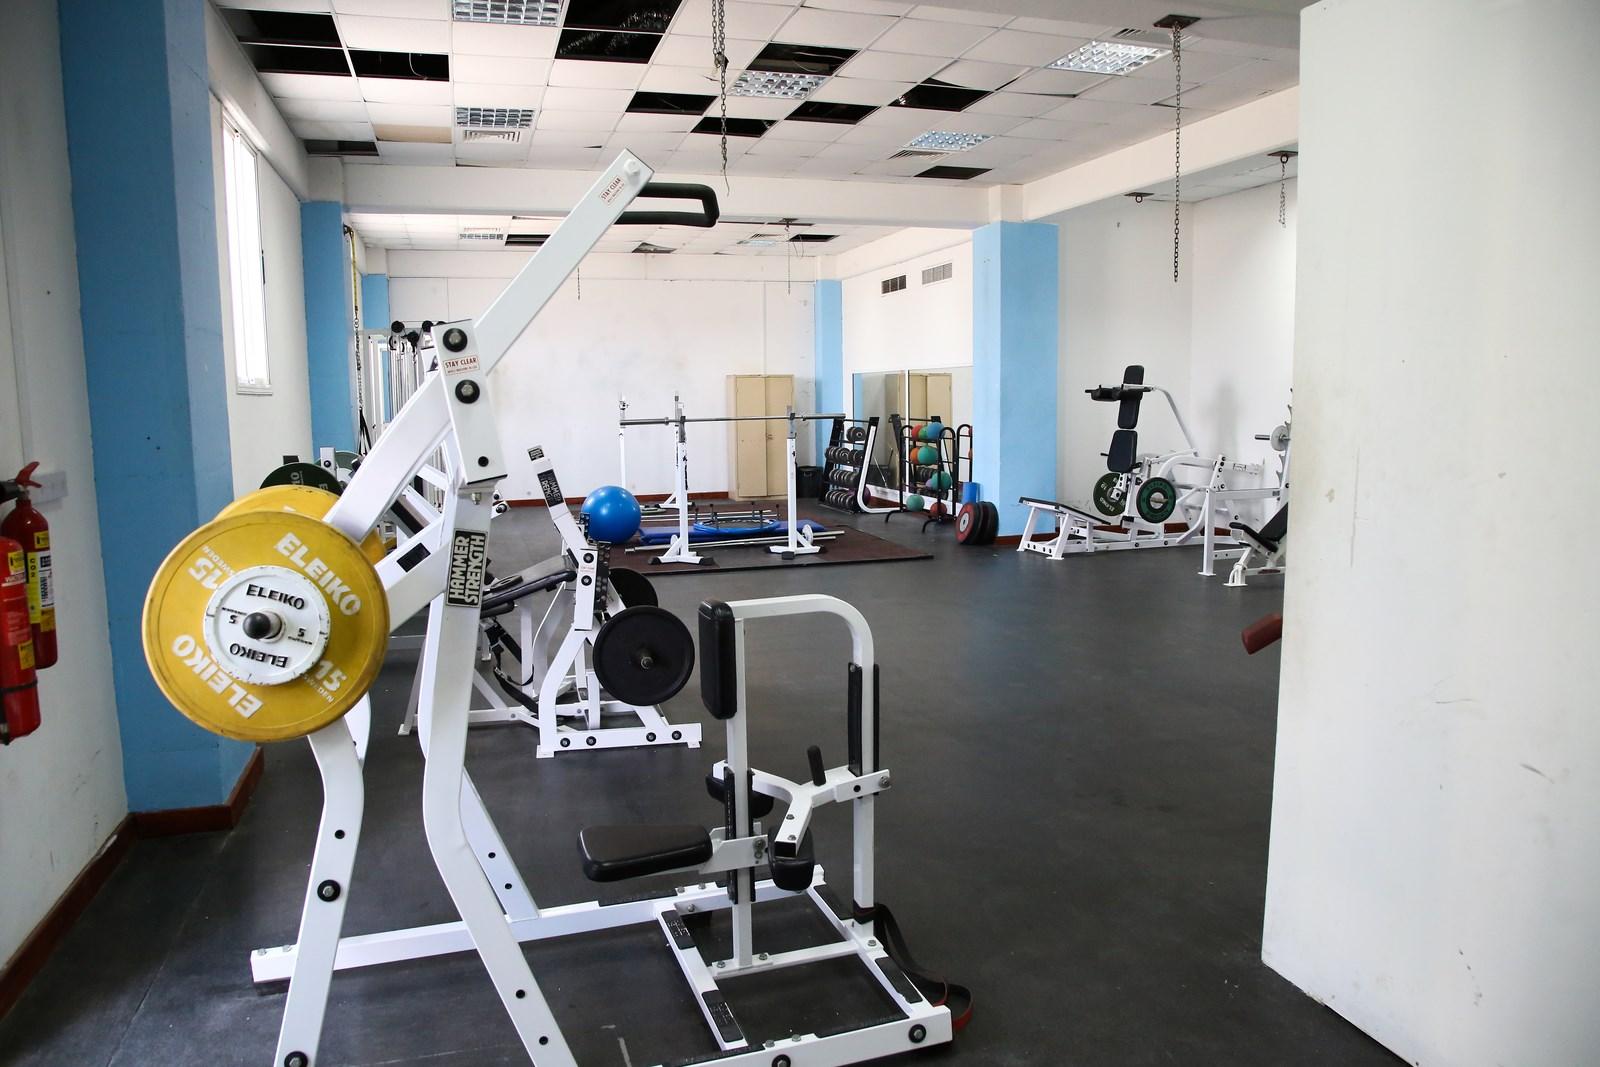 #Gyms